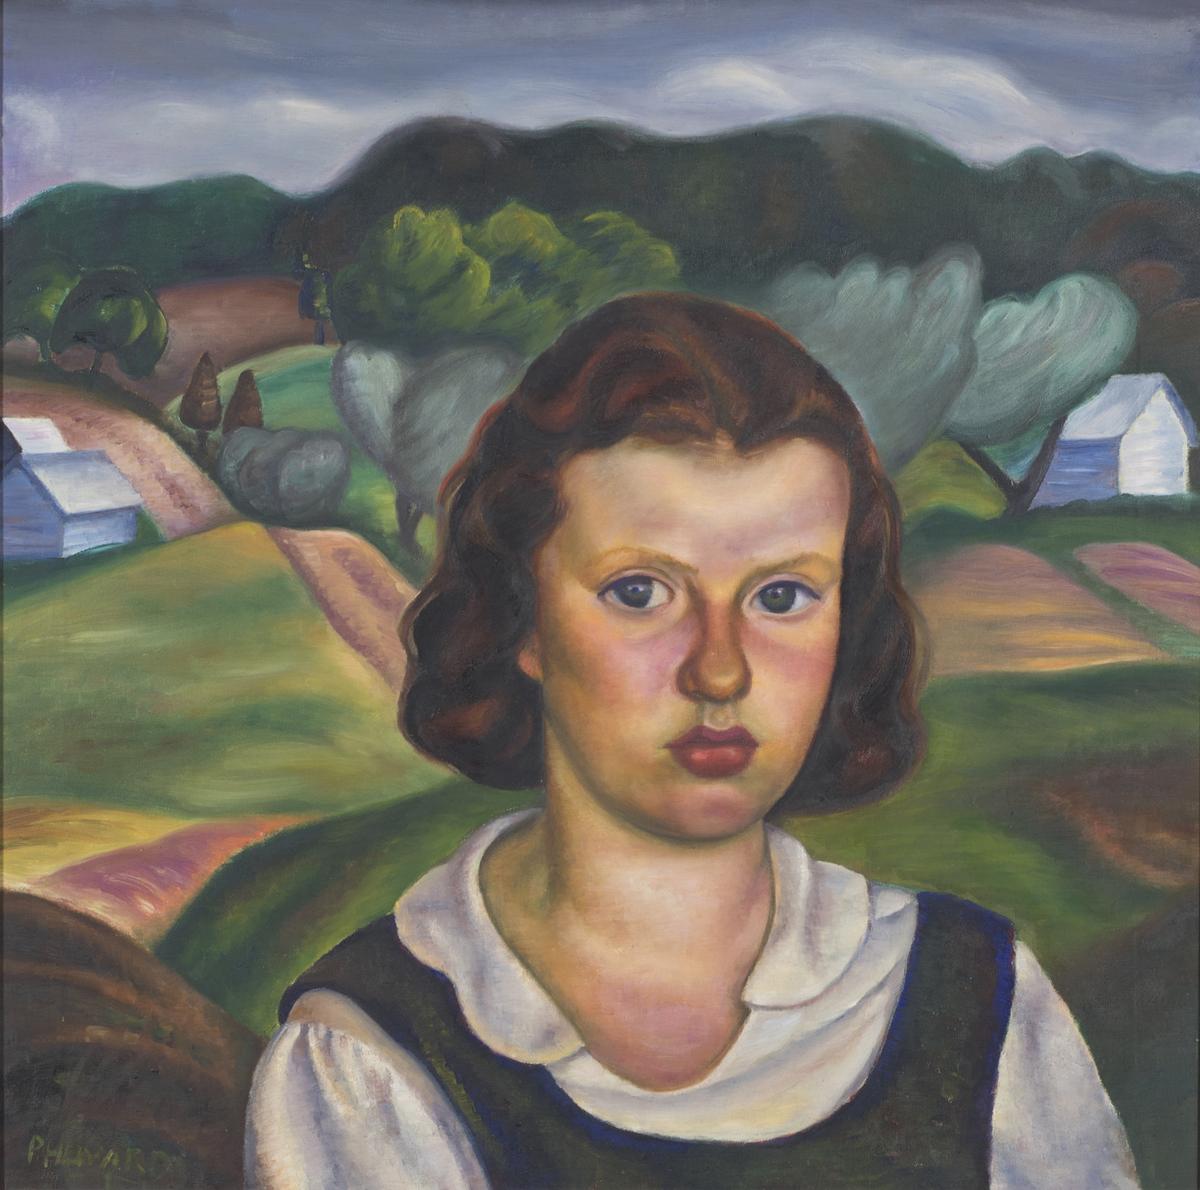 G-51-170 Farmer's Daughter E. Prudence Heward